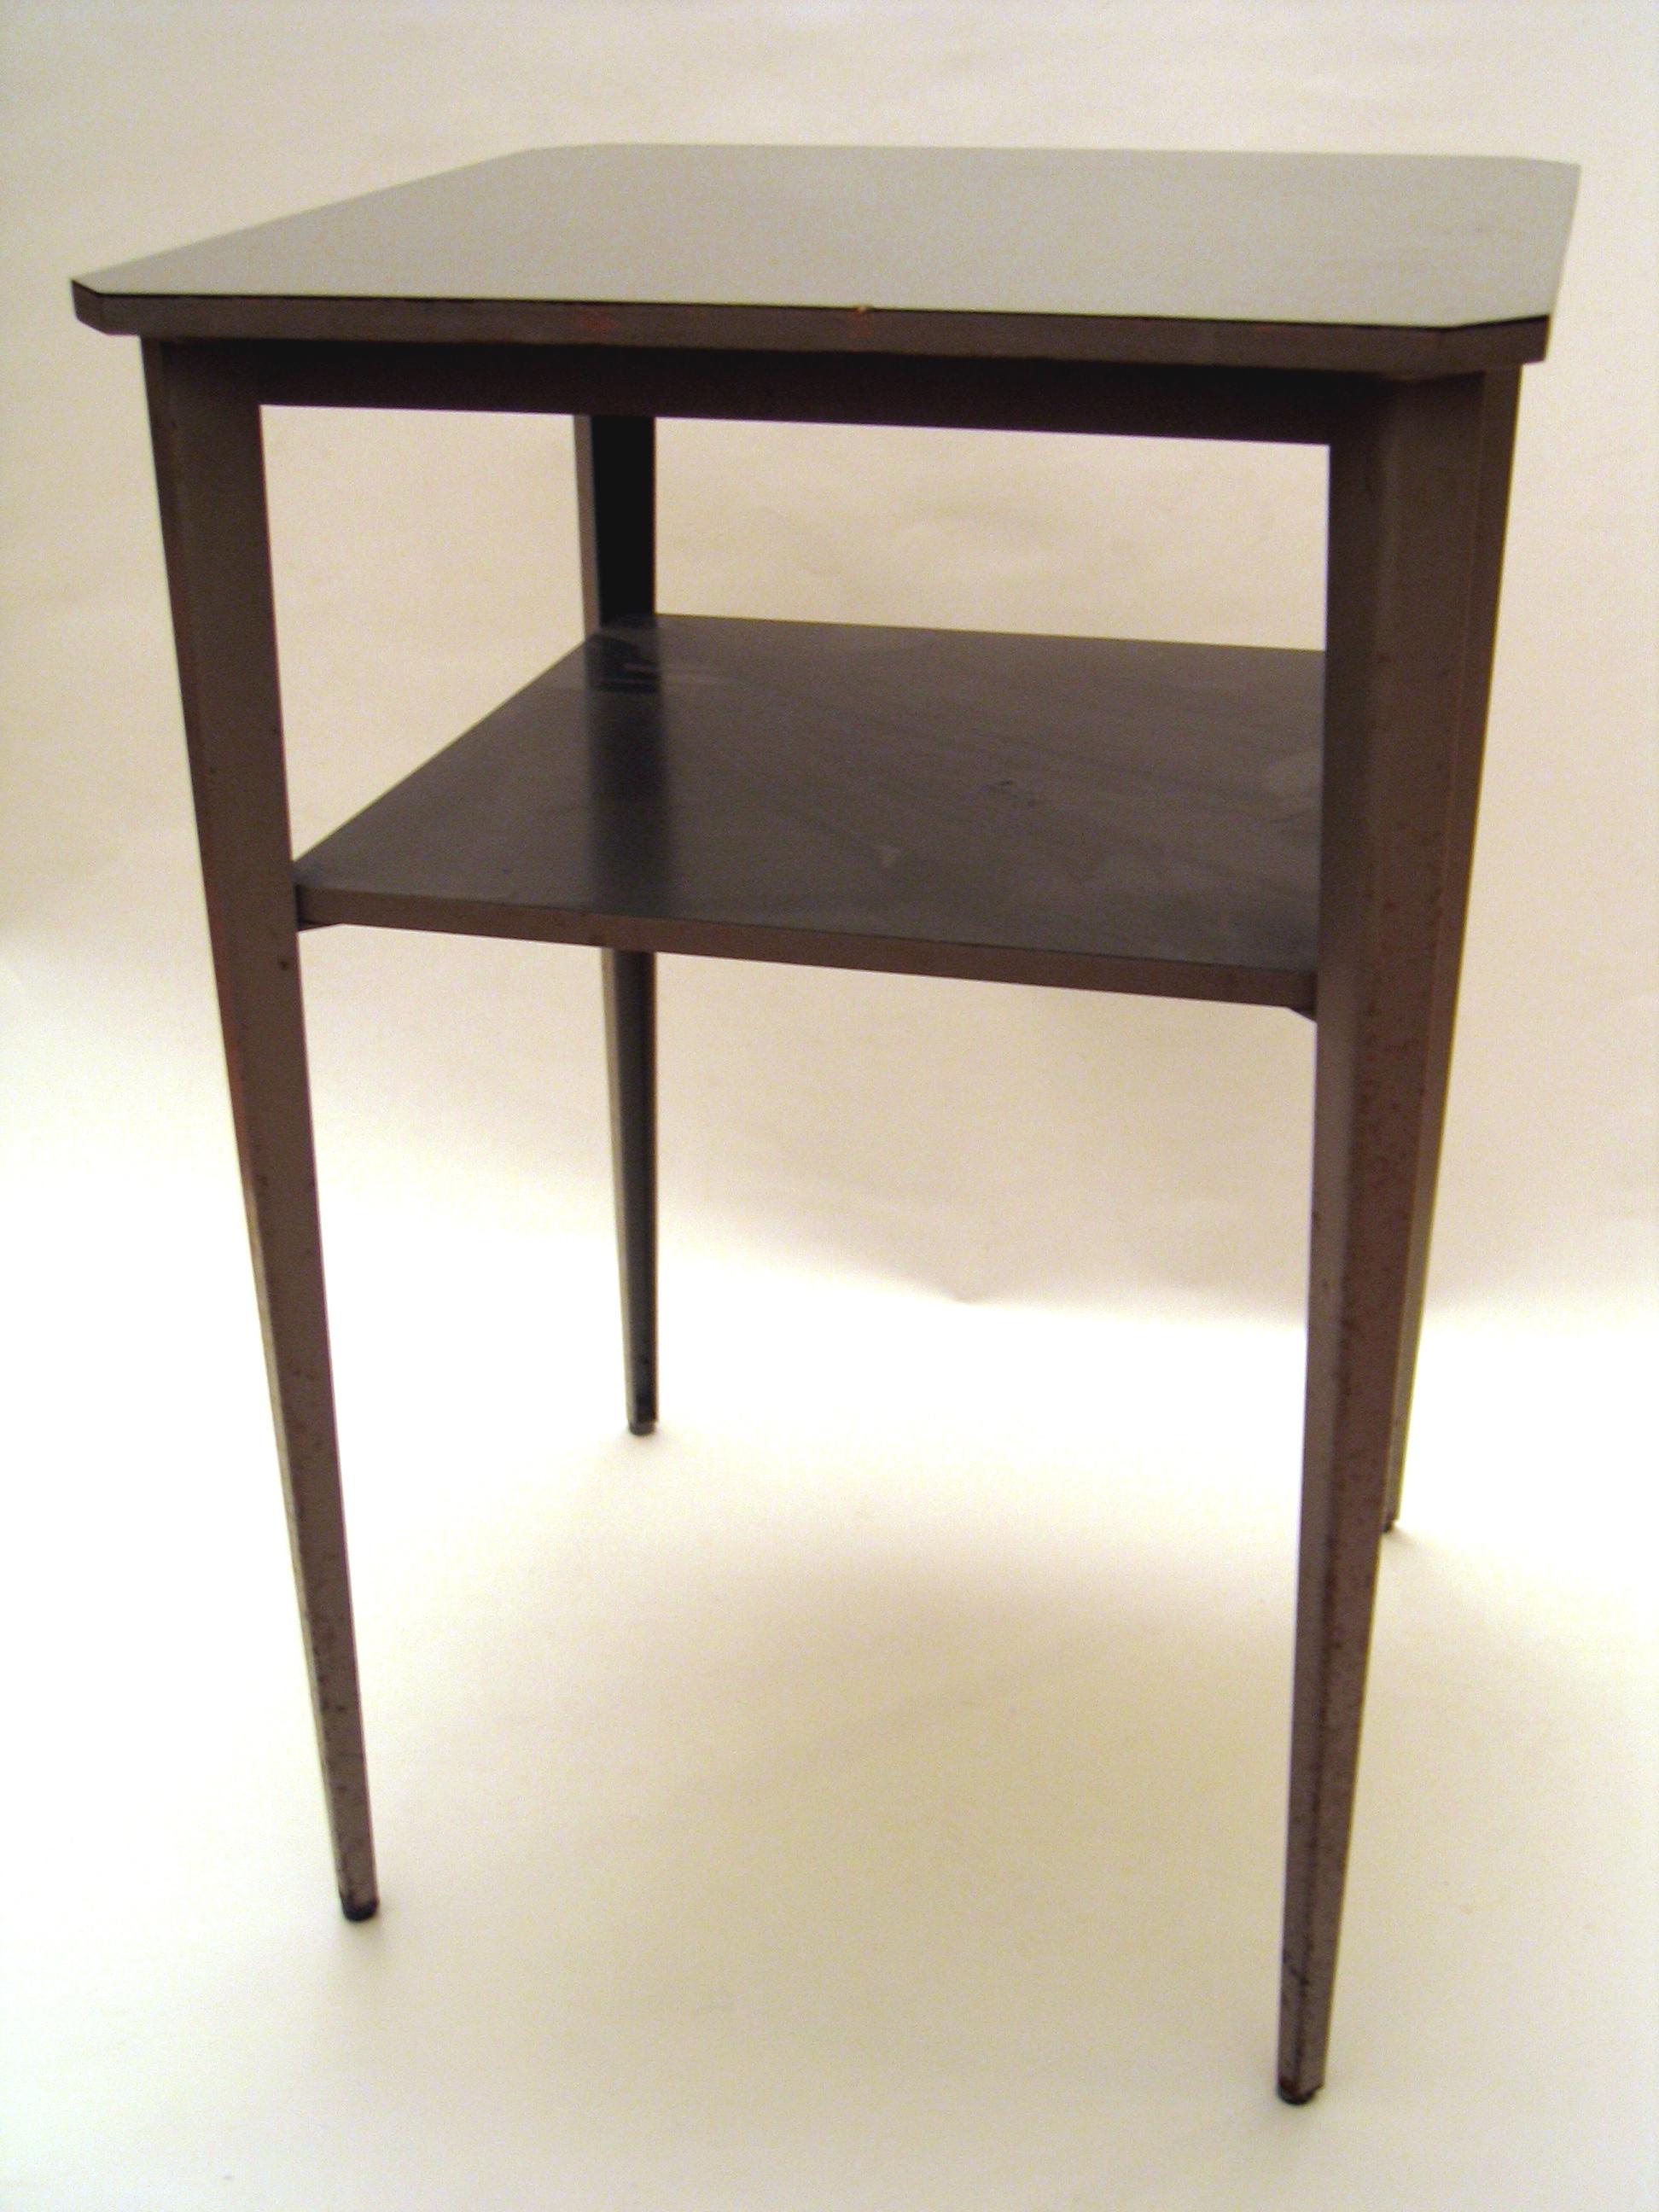 Wim Rietveld 'Rebel' telephone table